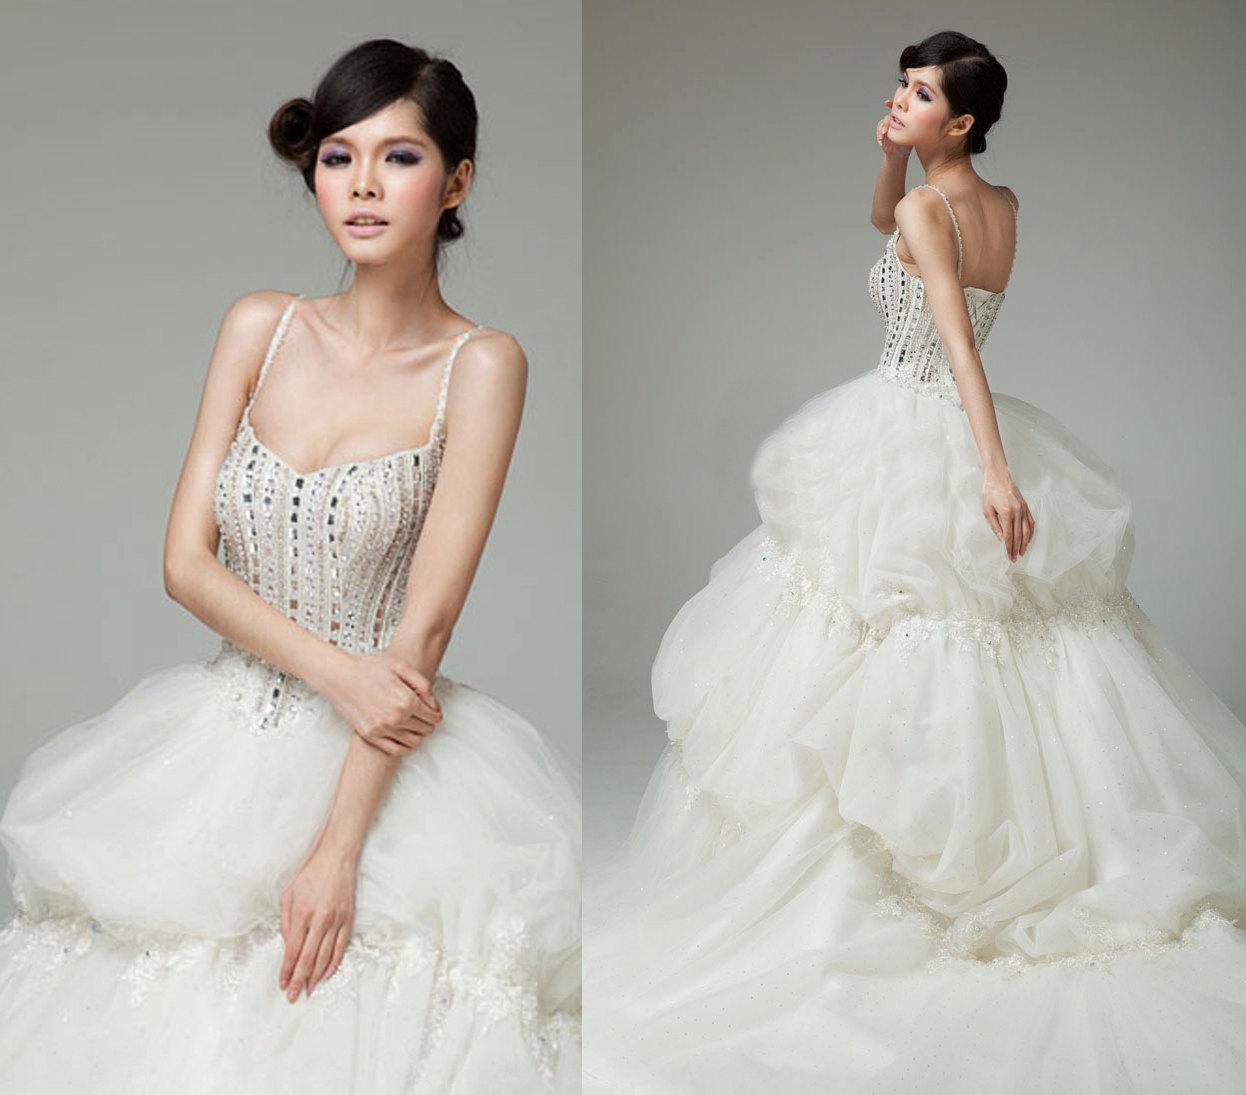 43 Creative Wedding Dress Designs